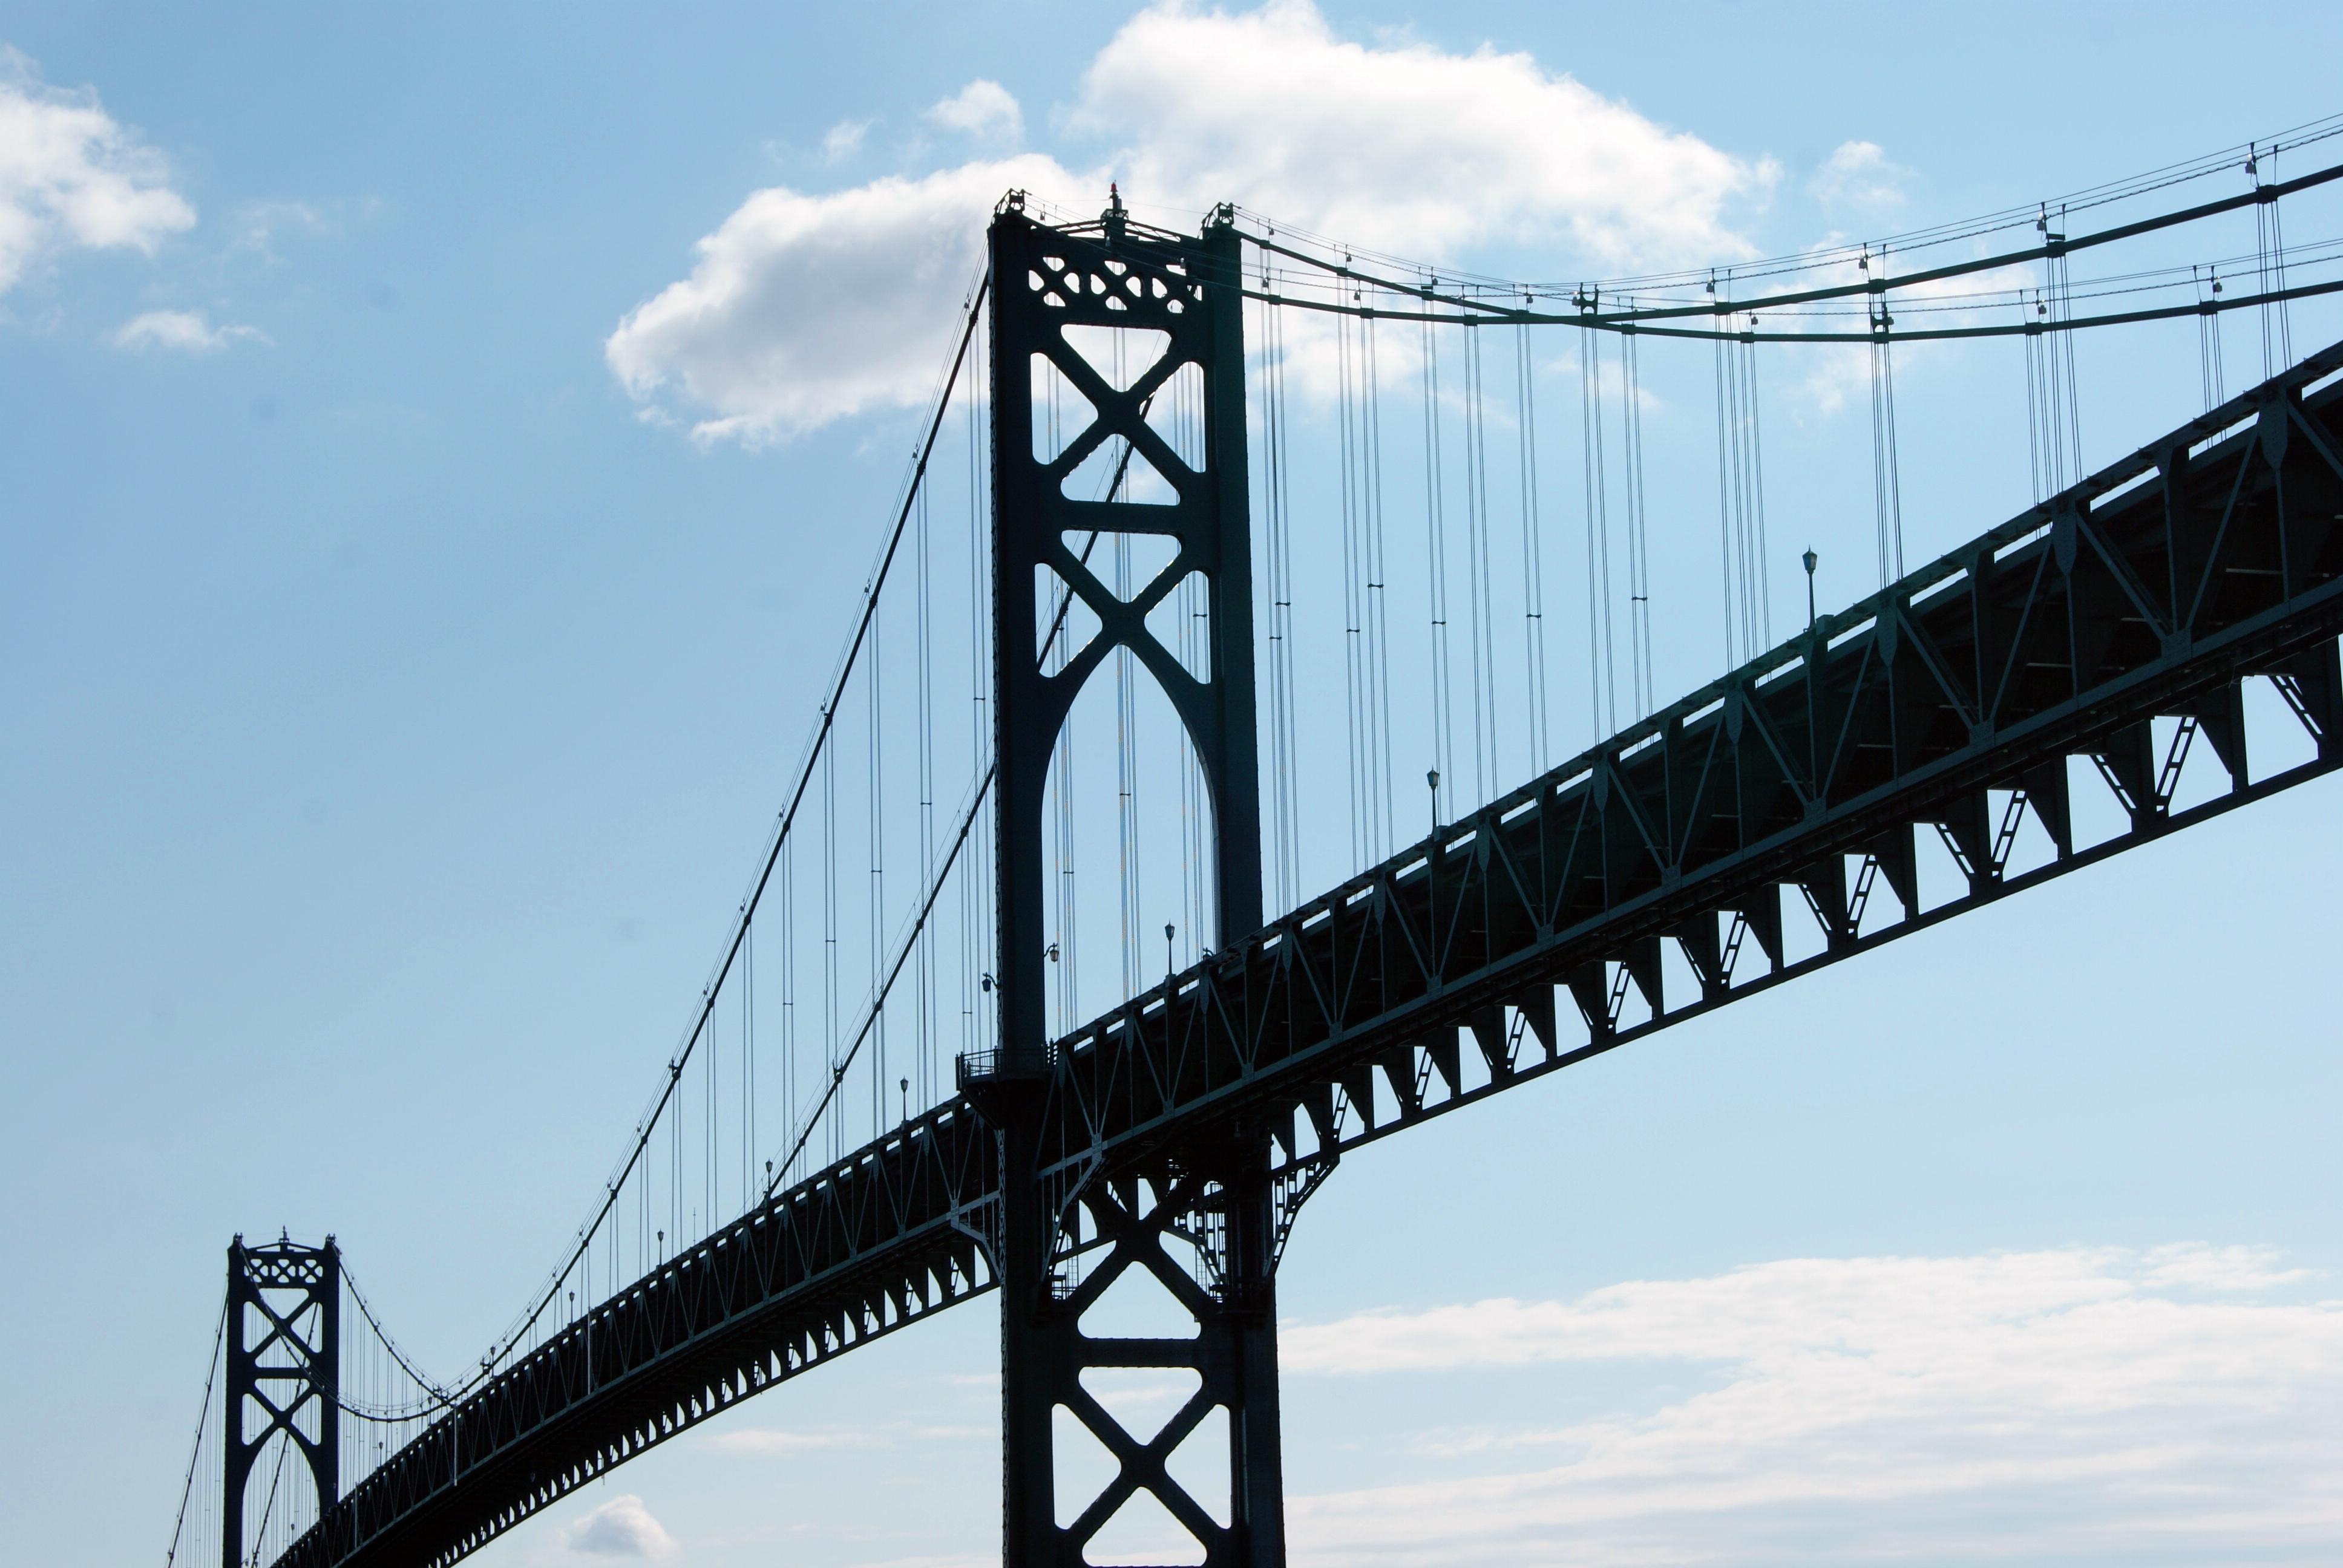 Tall steel bridge photo